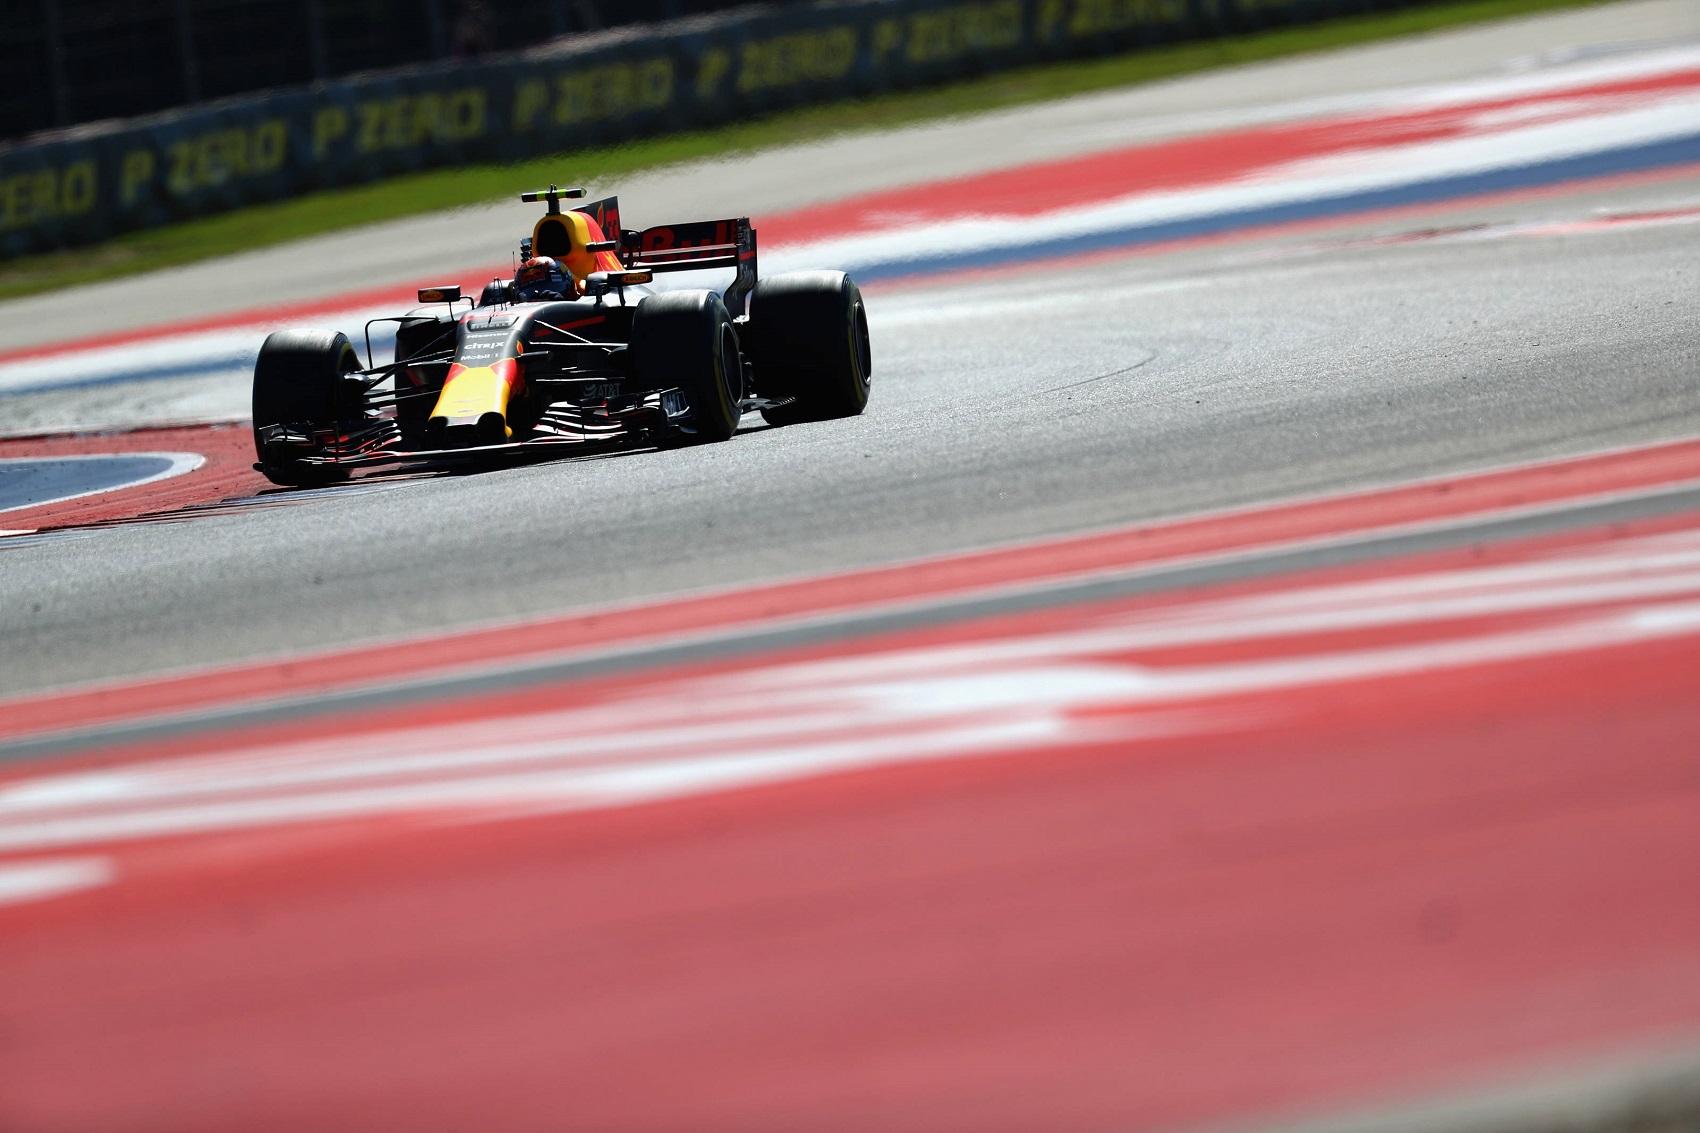 Max Verstappen Austin racingline, racinglinehu, racingline.hu